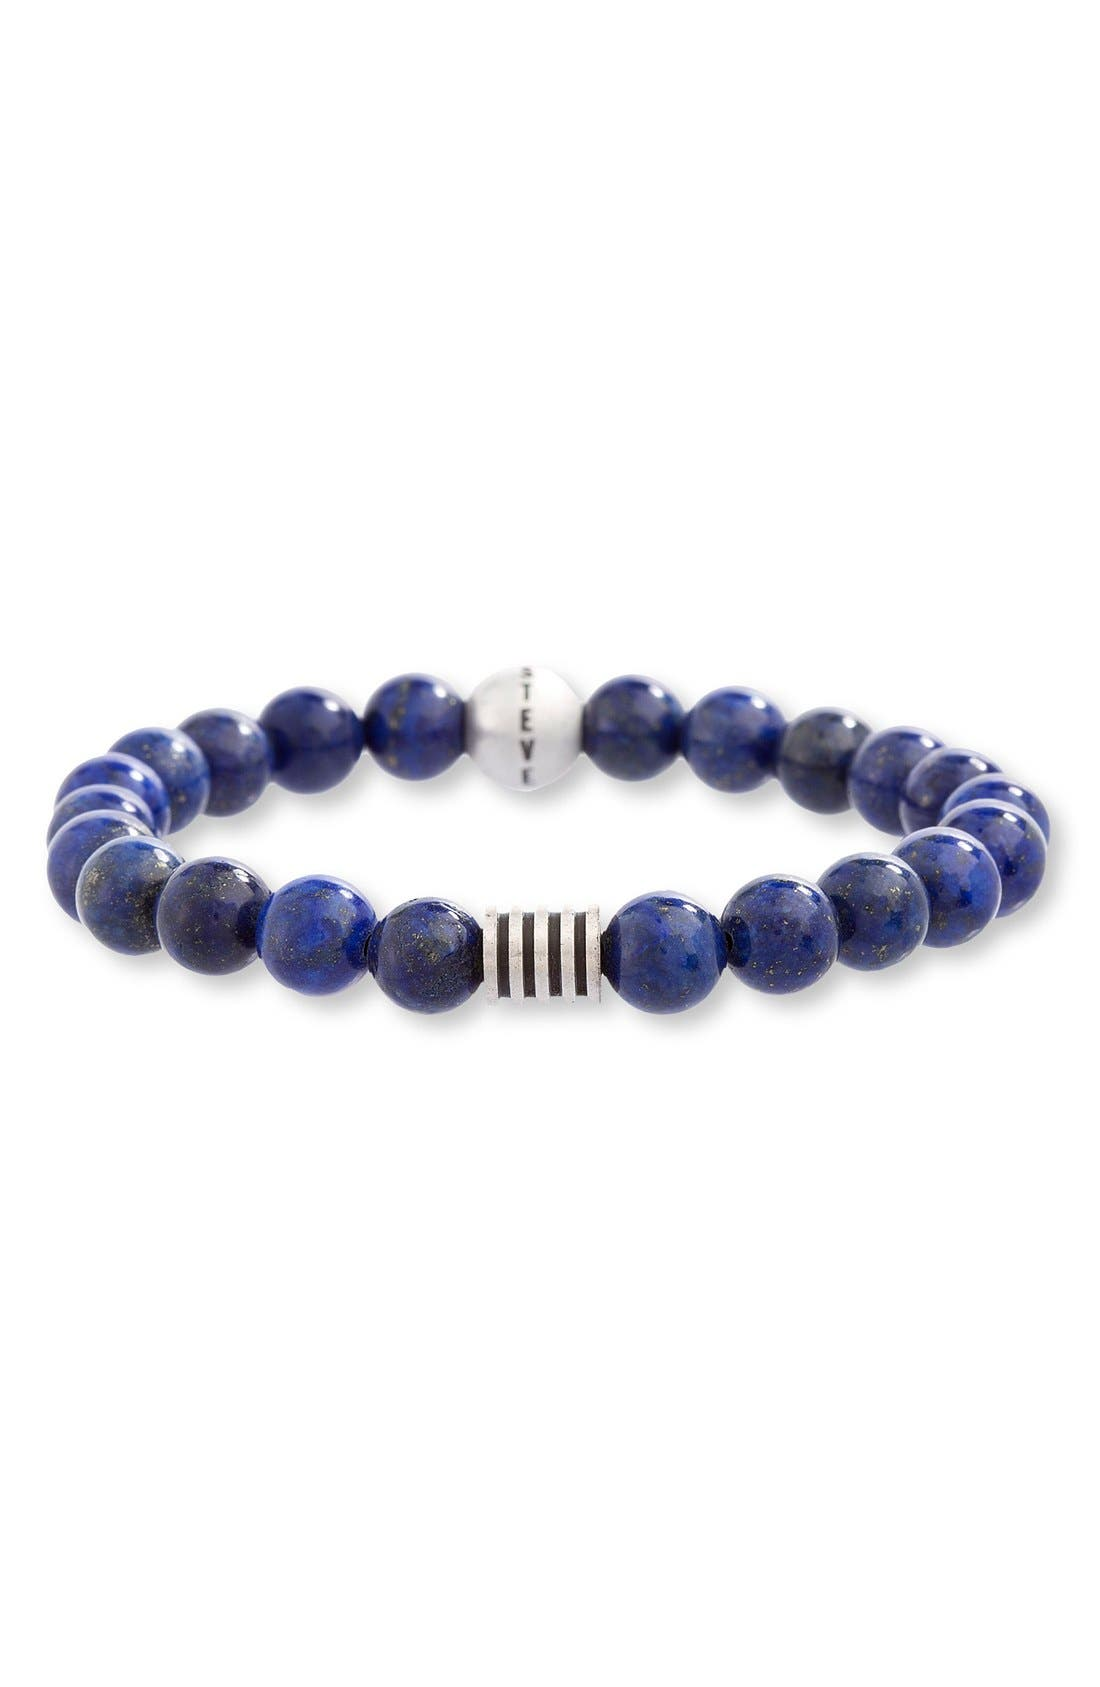 Lapis Lazuli Bead Bracelet,                             Main thumbnail 1, color,